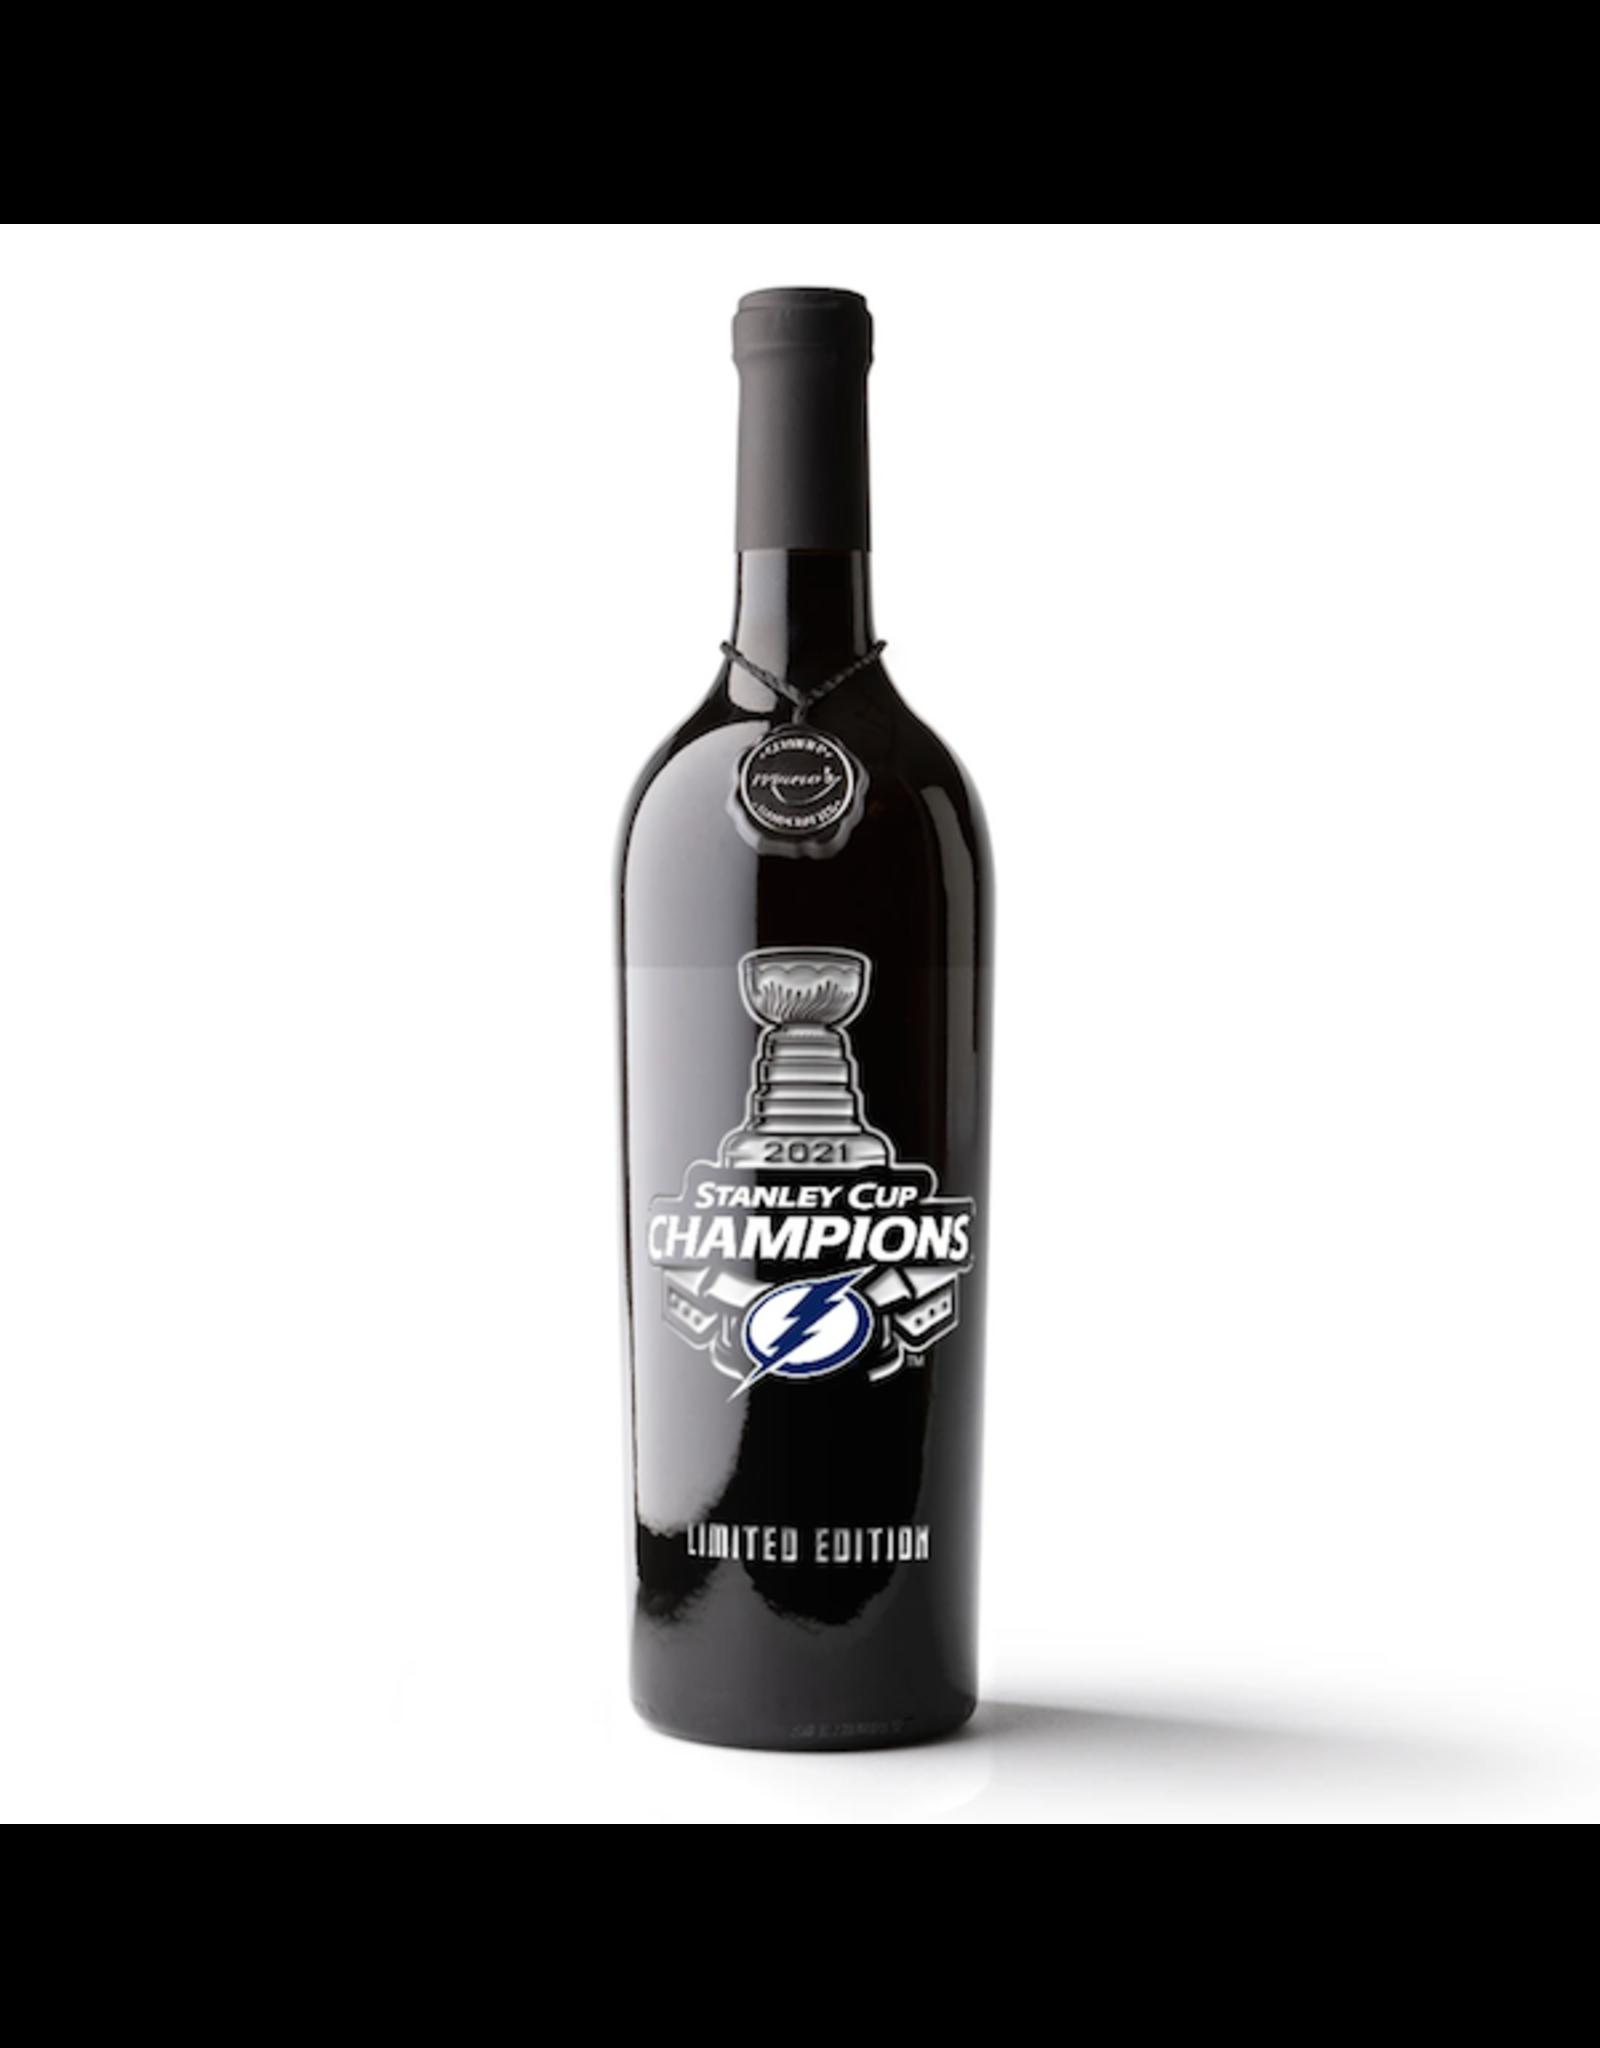 Red Wine NV, 2021 TAMPA BAY LIGHTNING Champions Etched Bottle ~ Limited Edition, Multi-regional Blend, Mutliple AVA, California, 13.5% Alc, CTnr